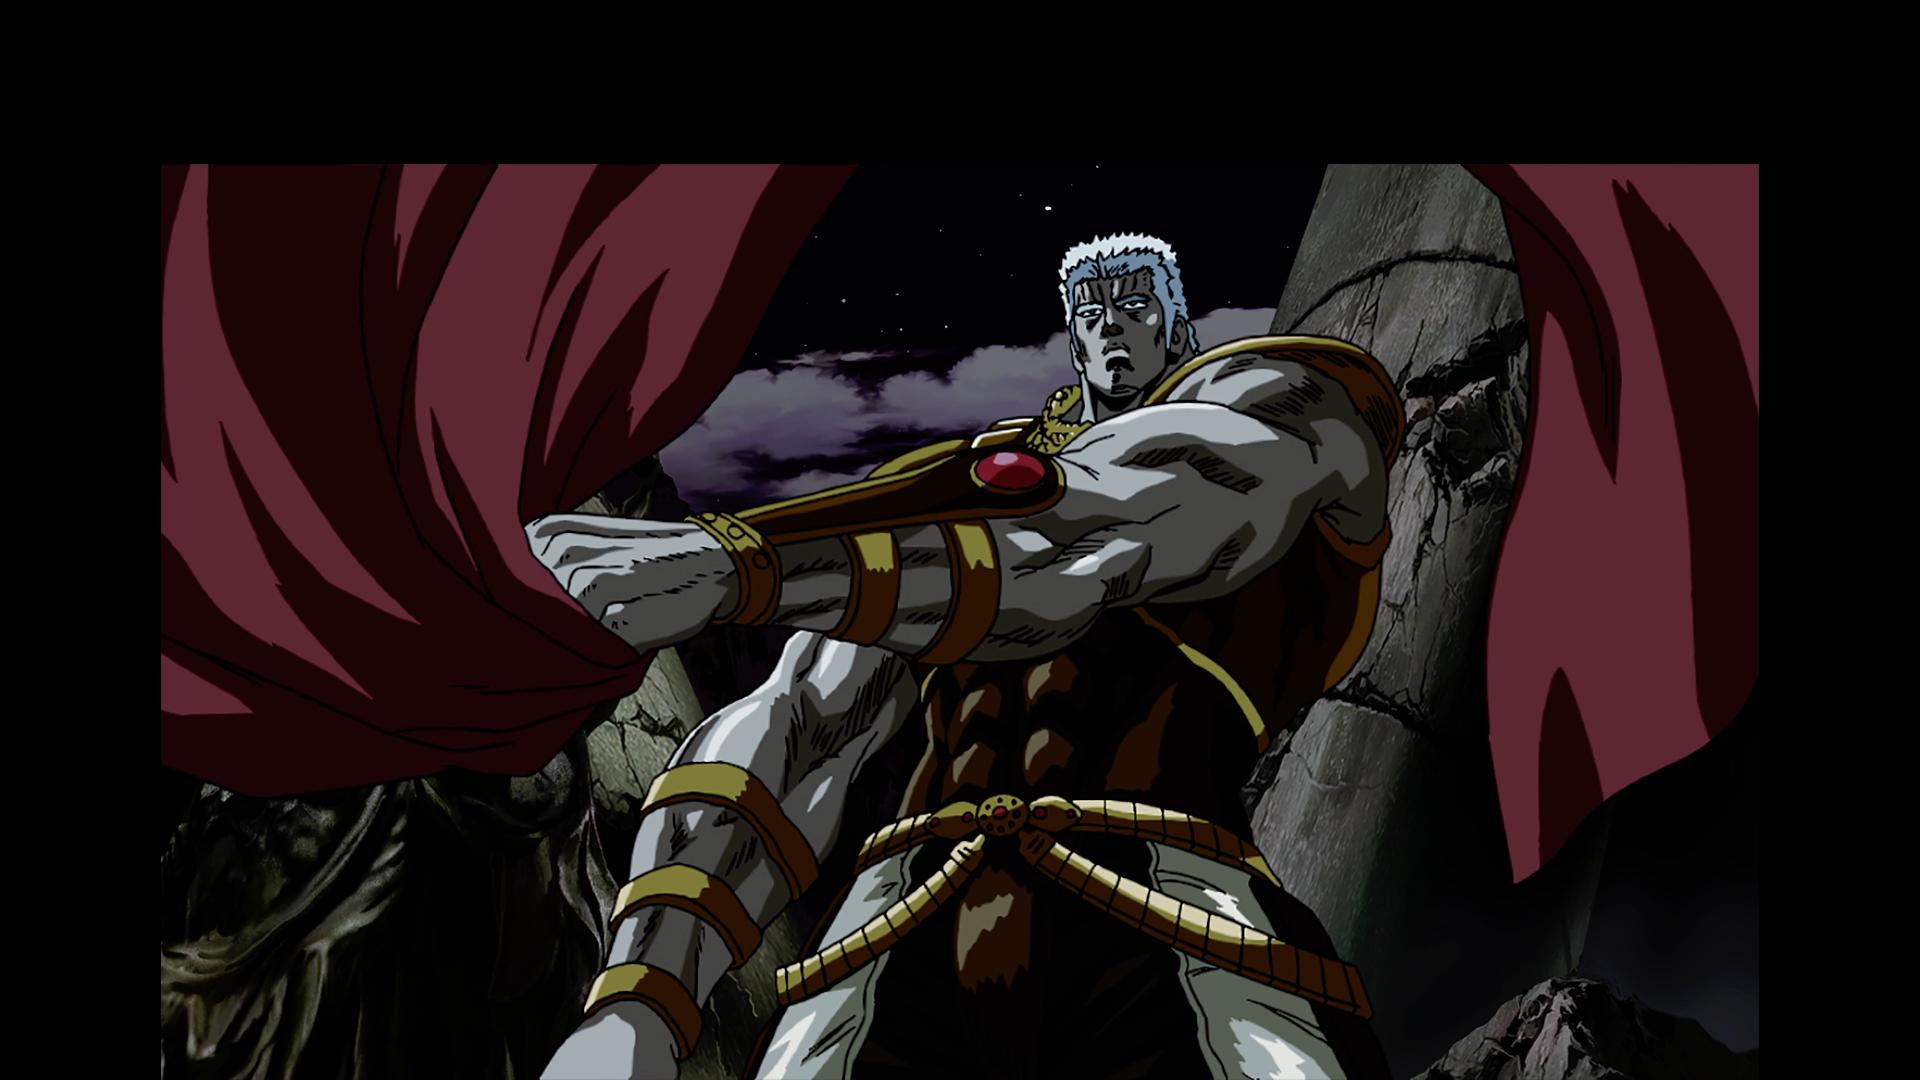 Ken il Guerriero – La Leggenda di Toki